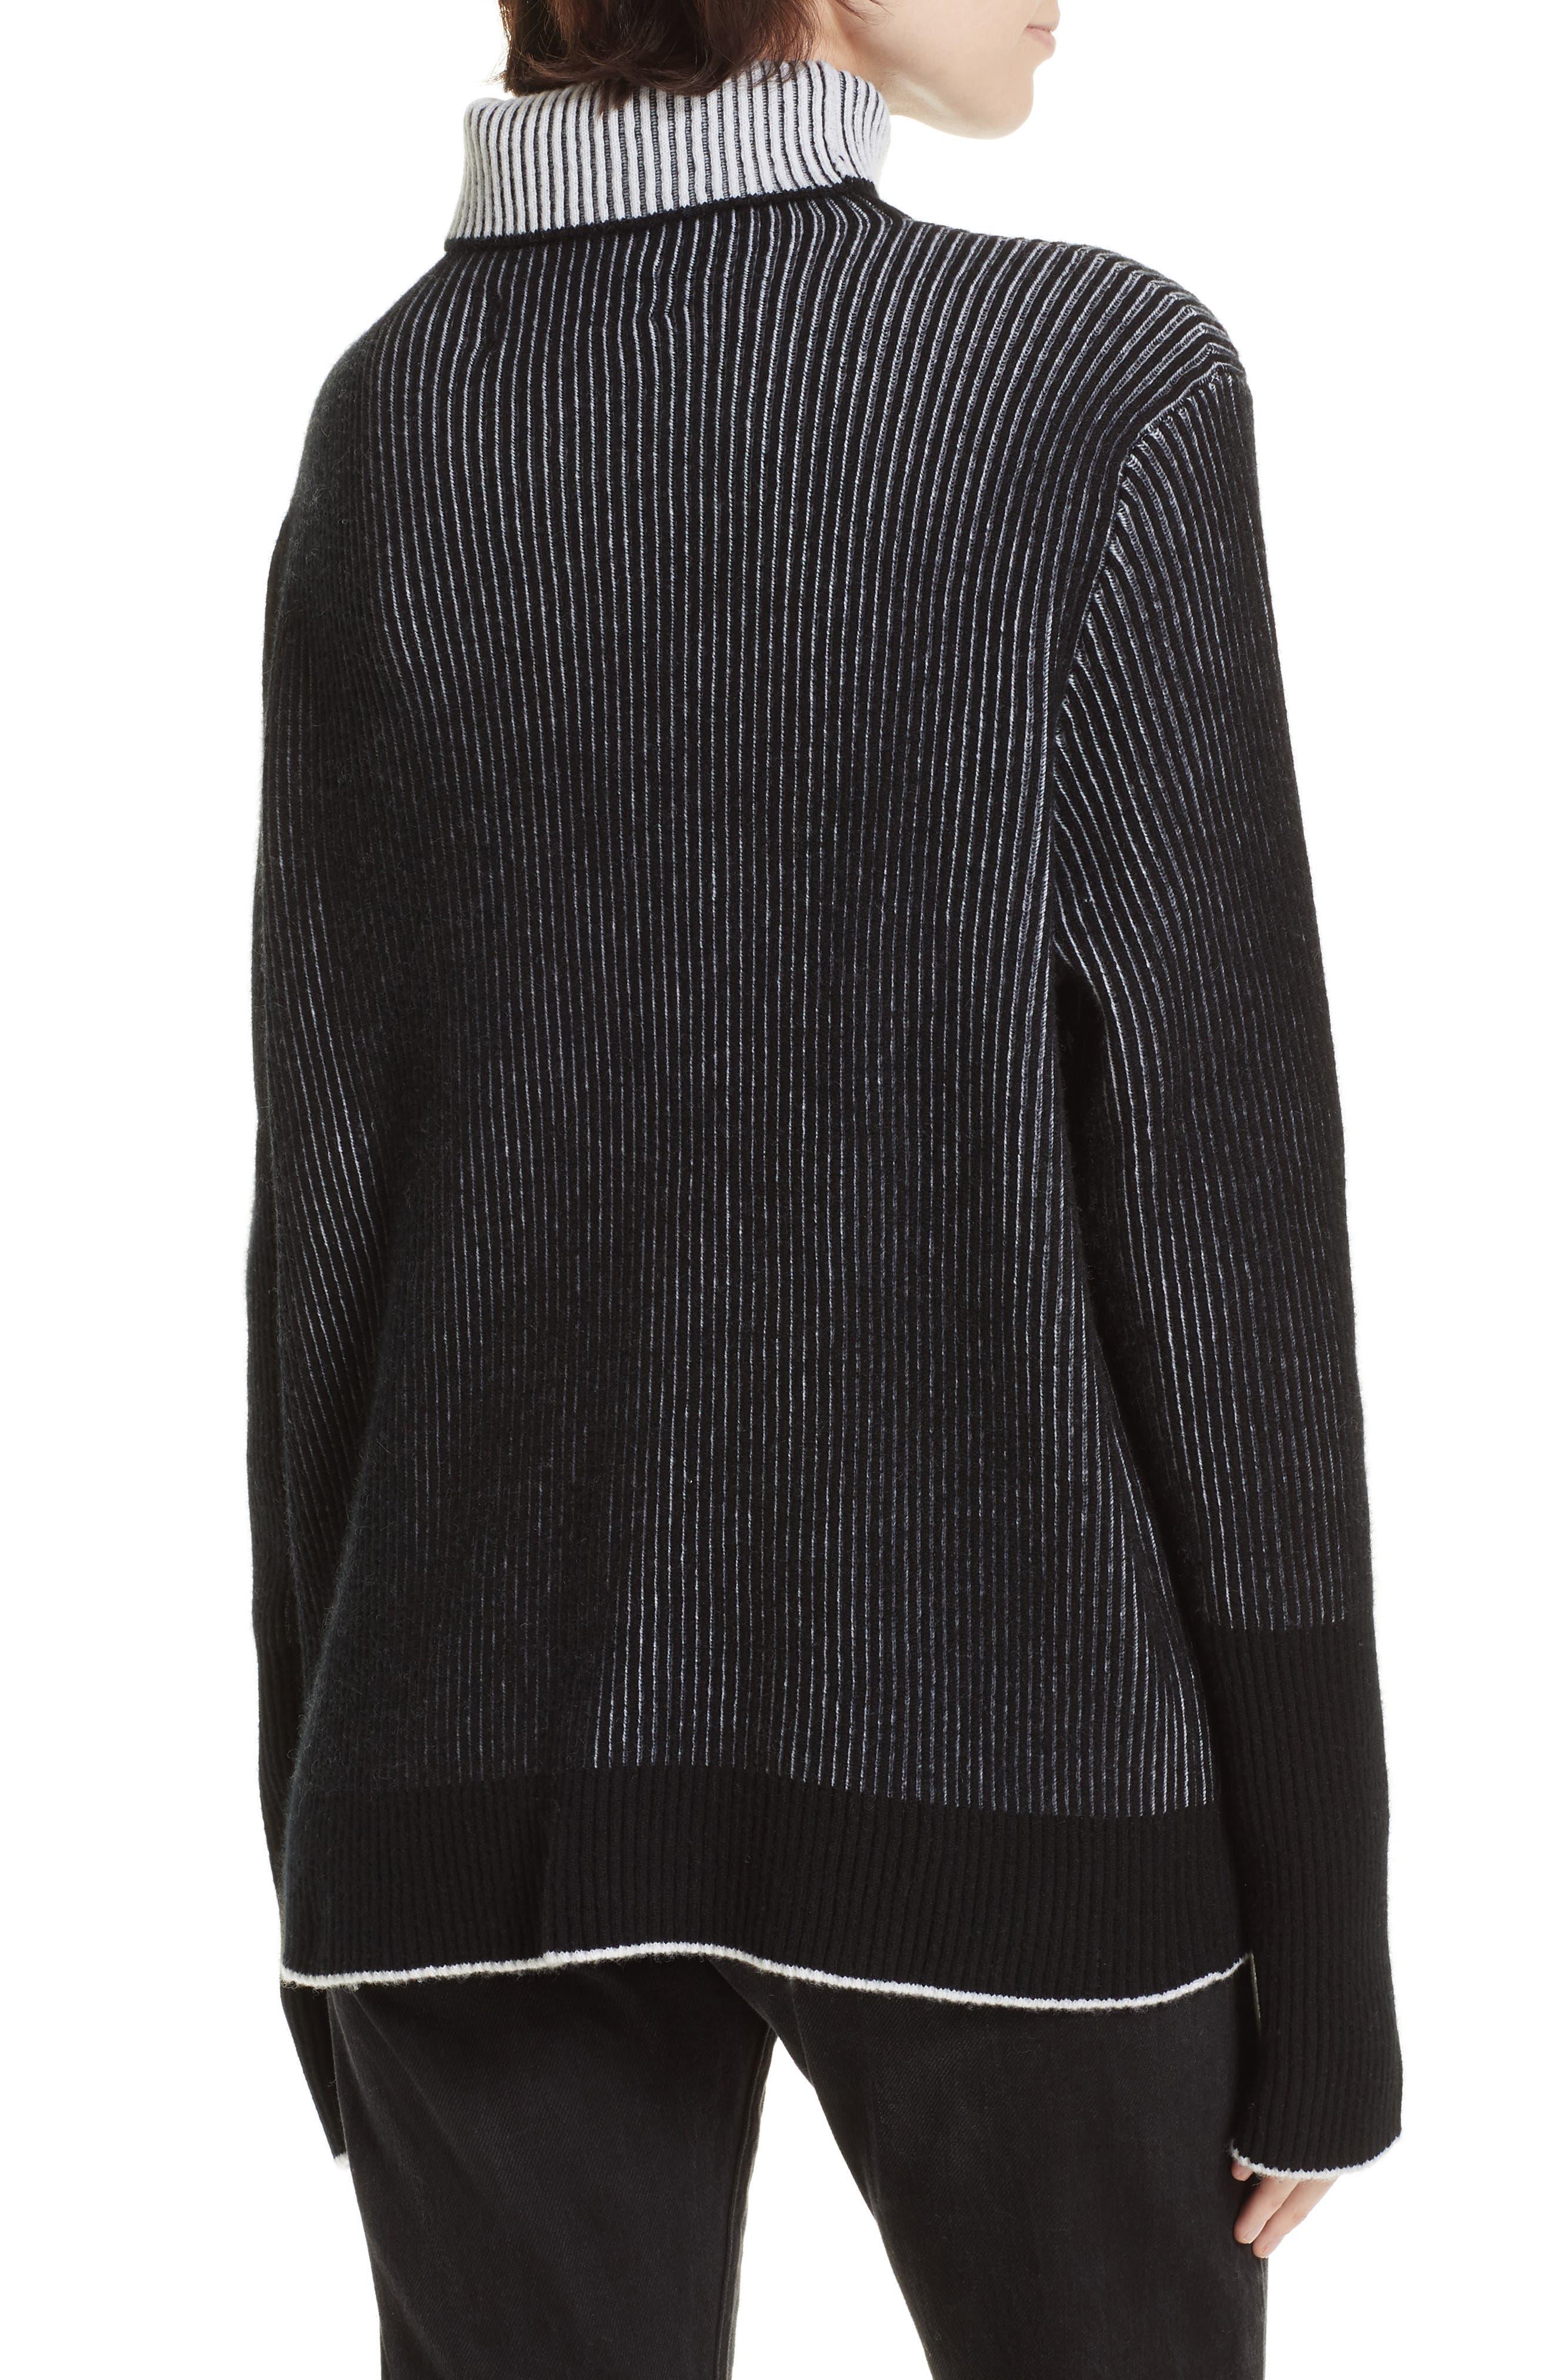 AAA Turtleneck Cashmere Sweater,                             Alternate thumbnail 2, color,                             BLACK/ CREAM